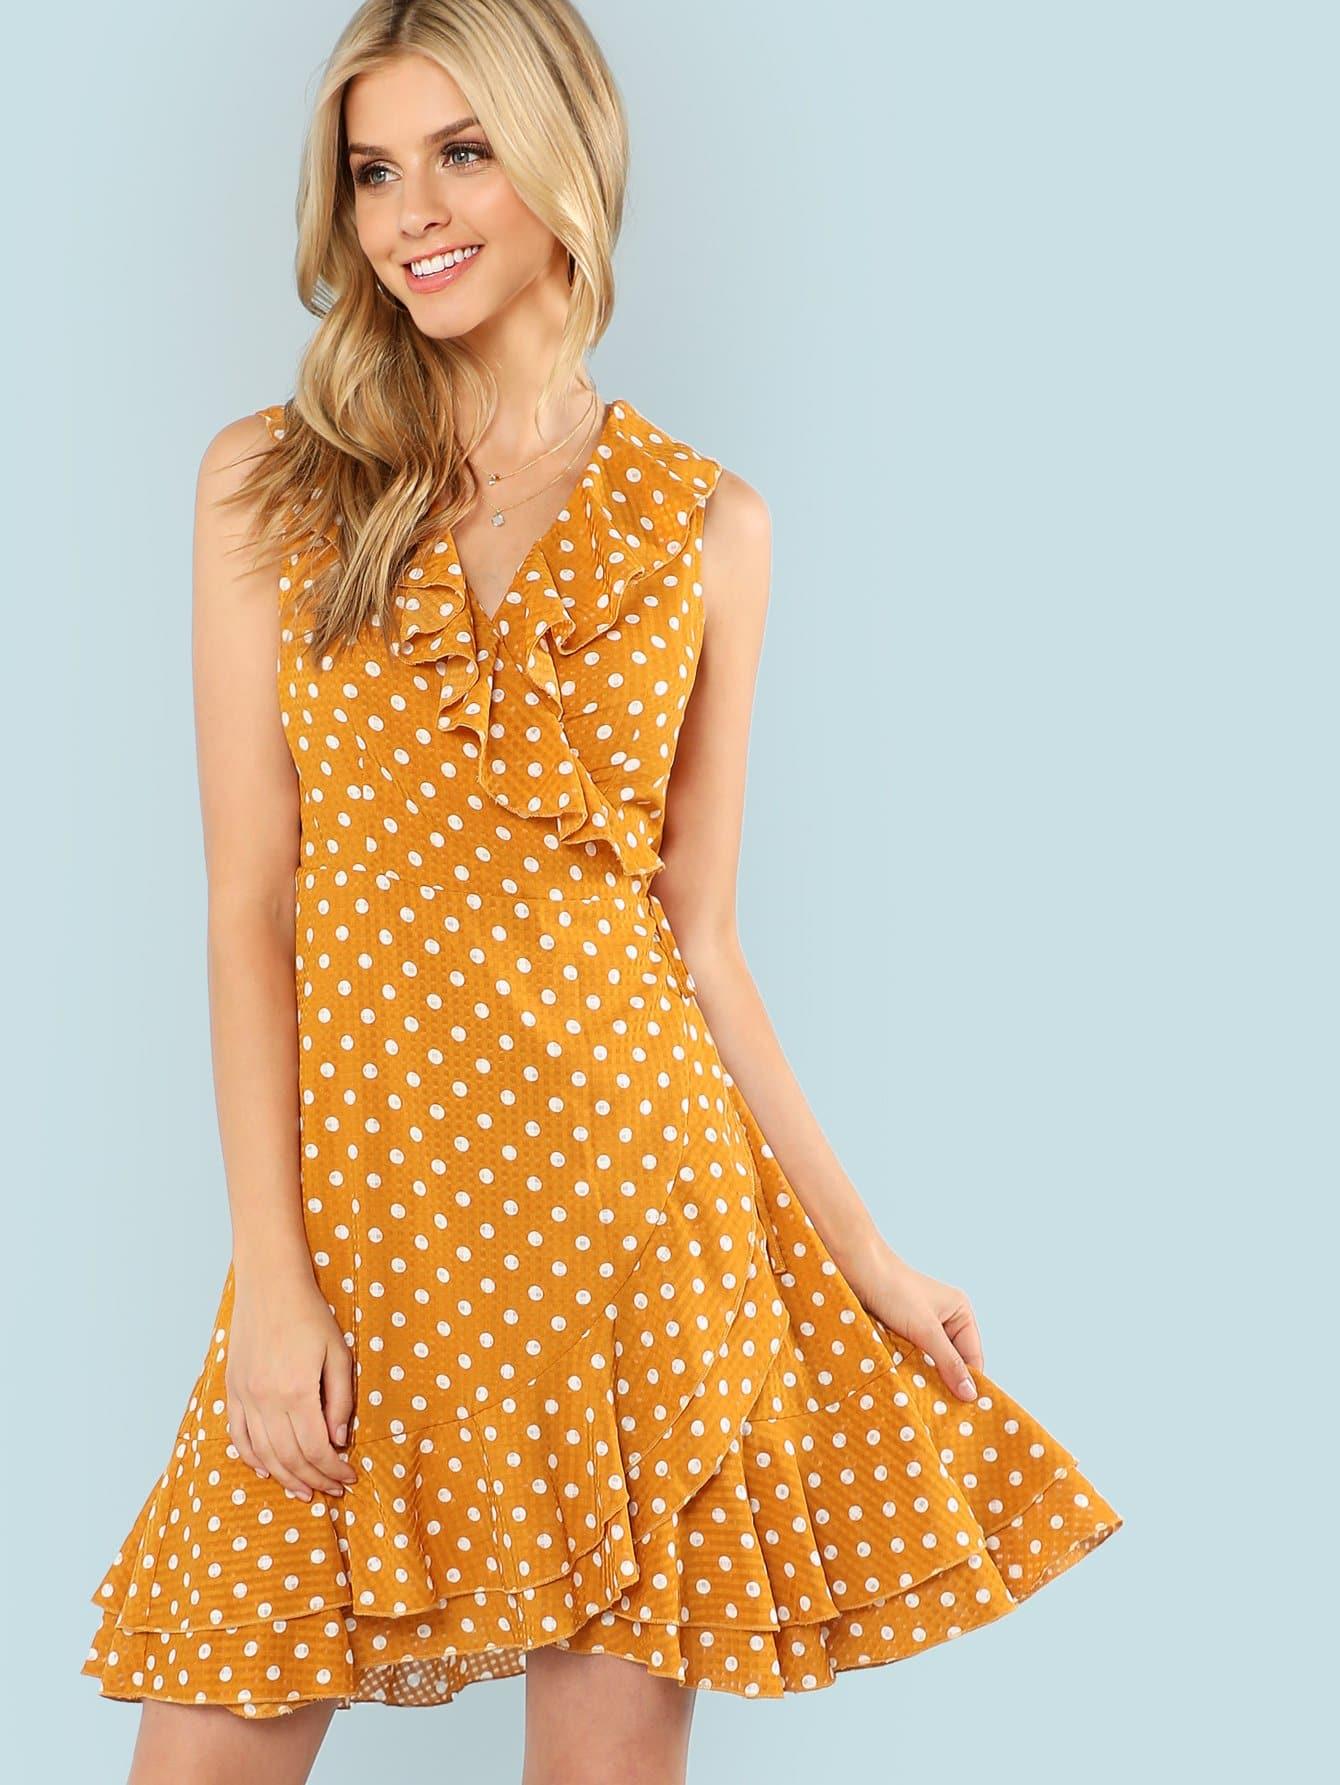 Polka Dot Layered Ruffle Hem Sleeveless Dress layered ruffle polka dot cami dress